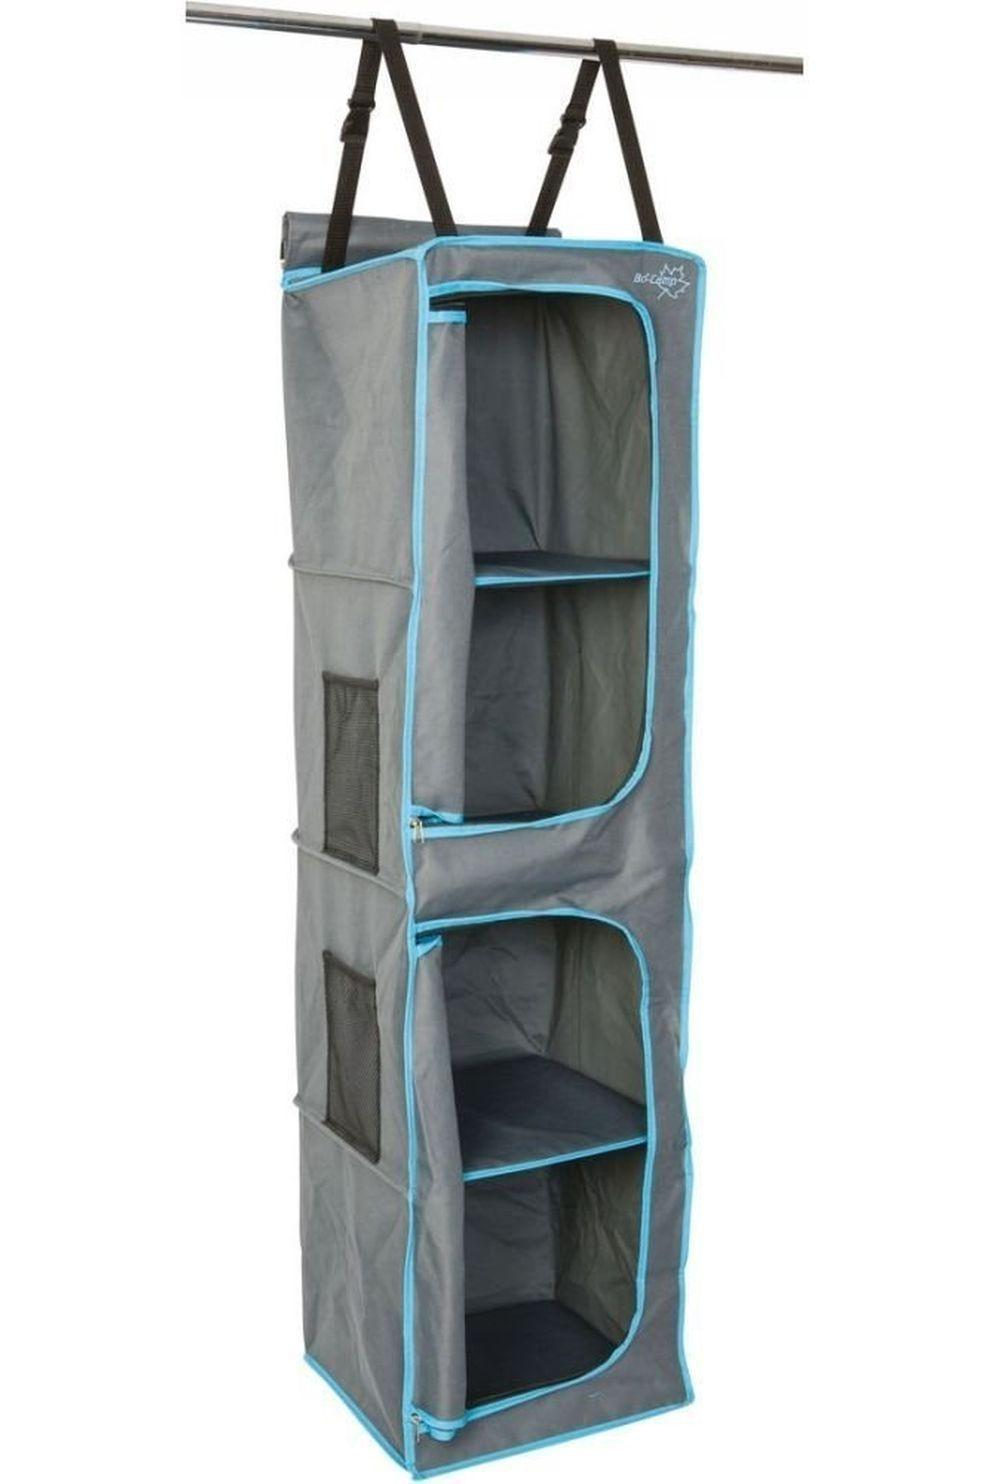 Bo-Camp Accessoire Organizer 4-Vaks 2 Deurtjes 35X35X131 Cm - Grijs/Blauw